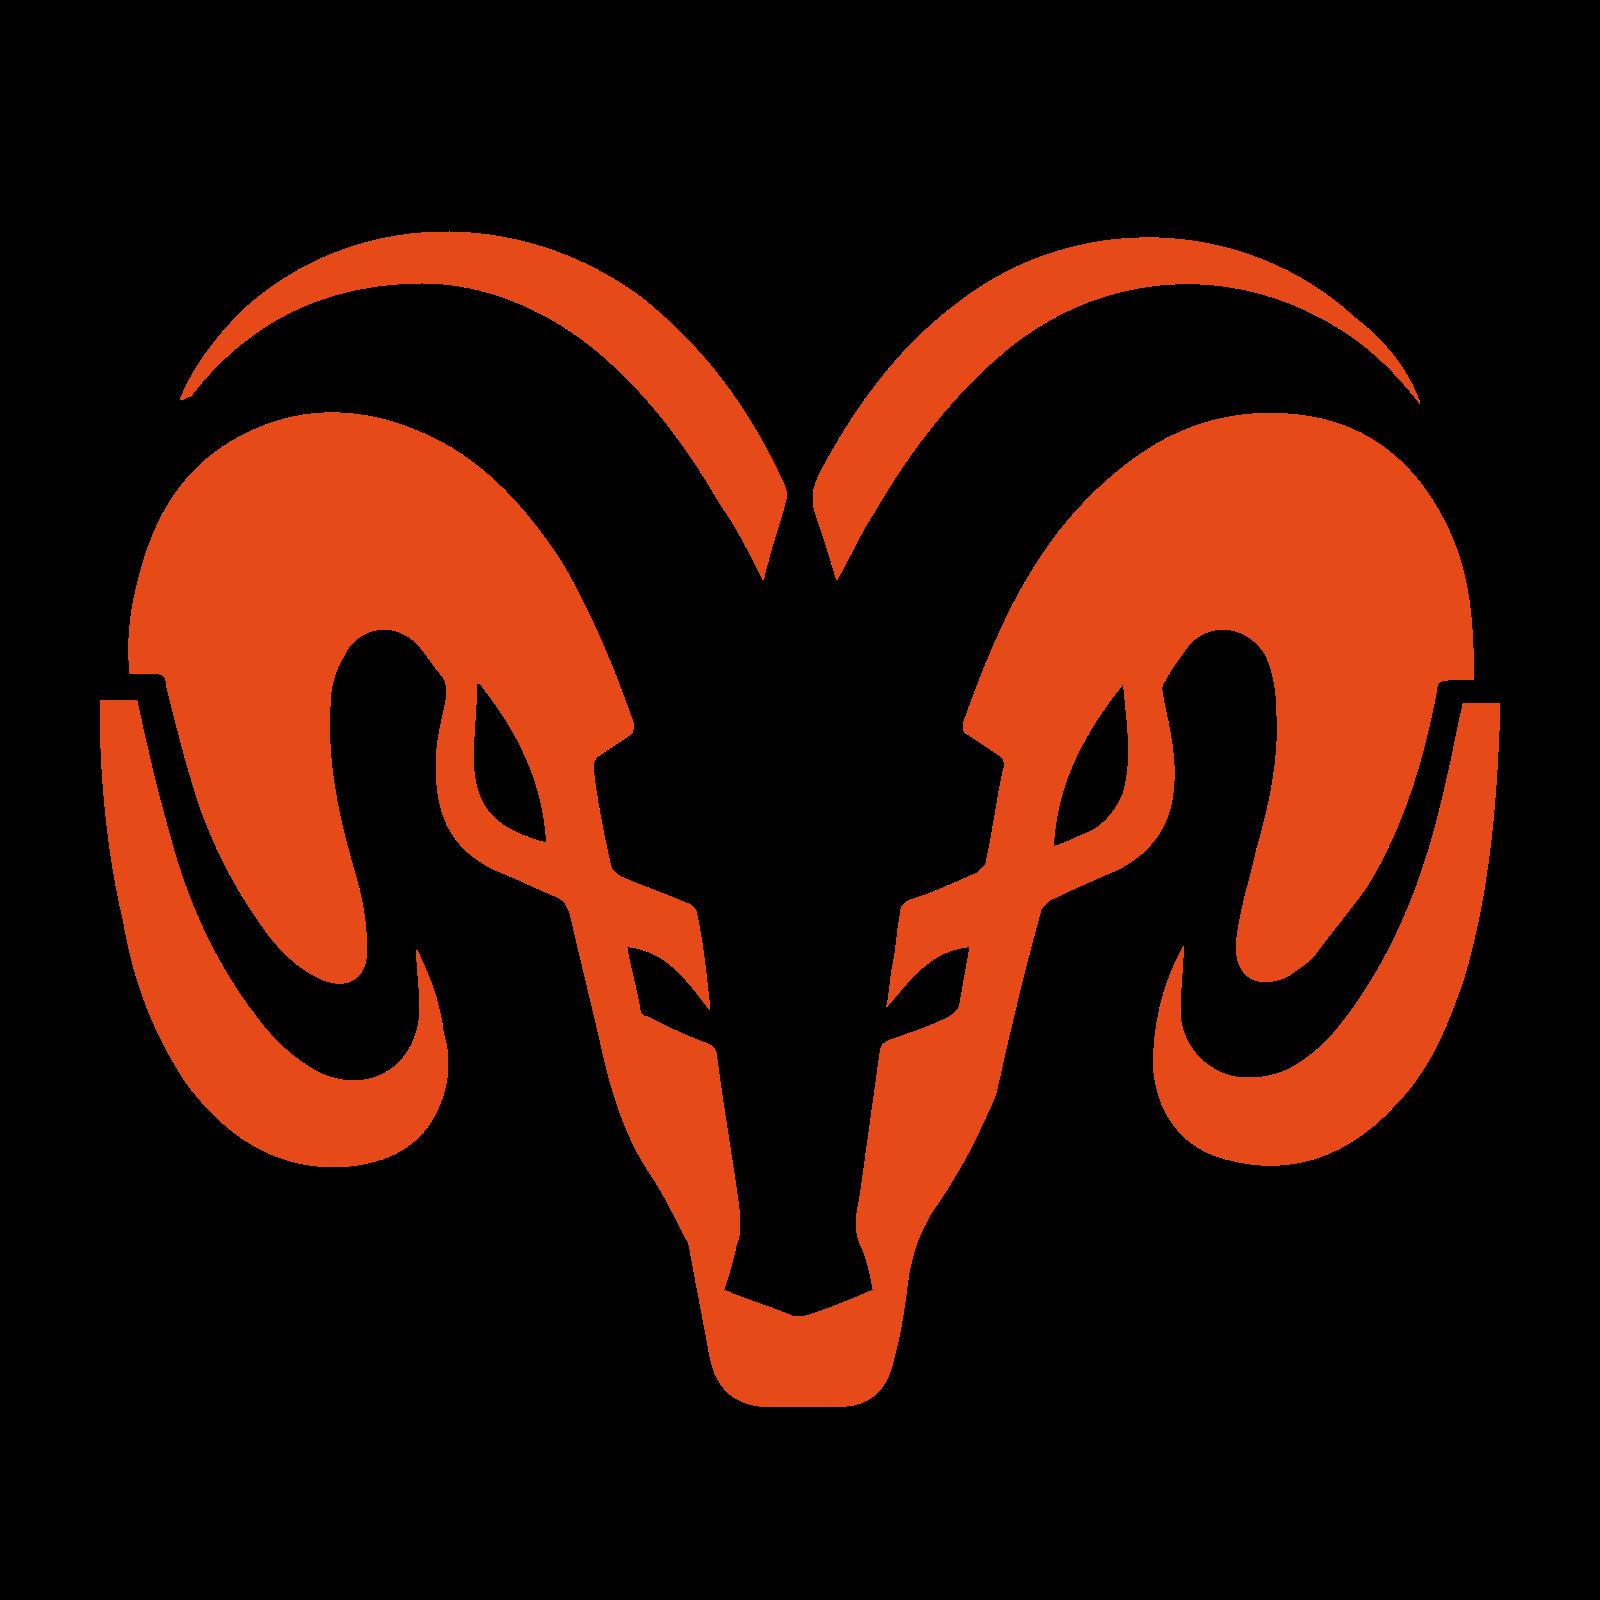 Baran icon